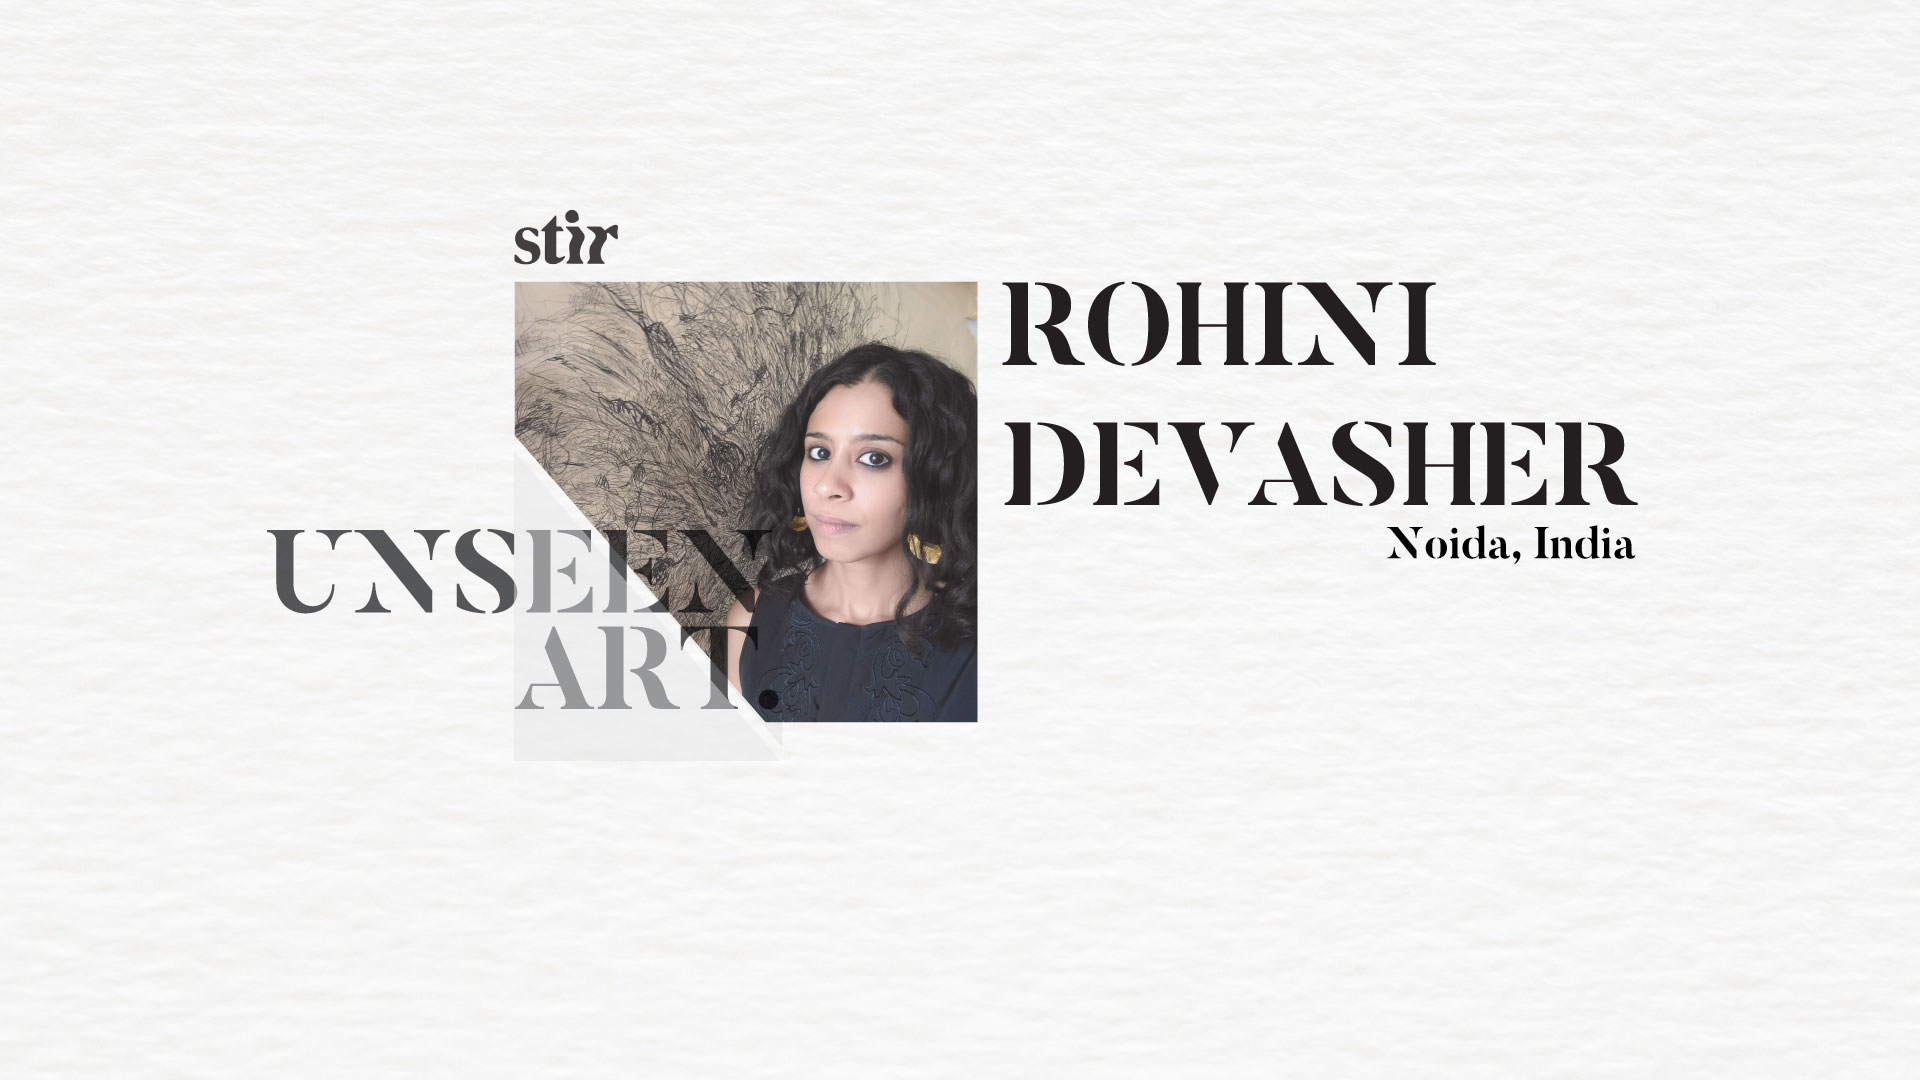 Unseen Art: Why the study of the Sunflower head never left Rohini Devasher's studio